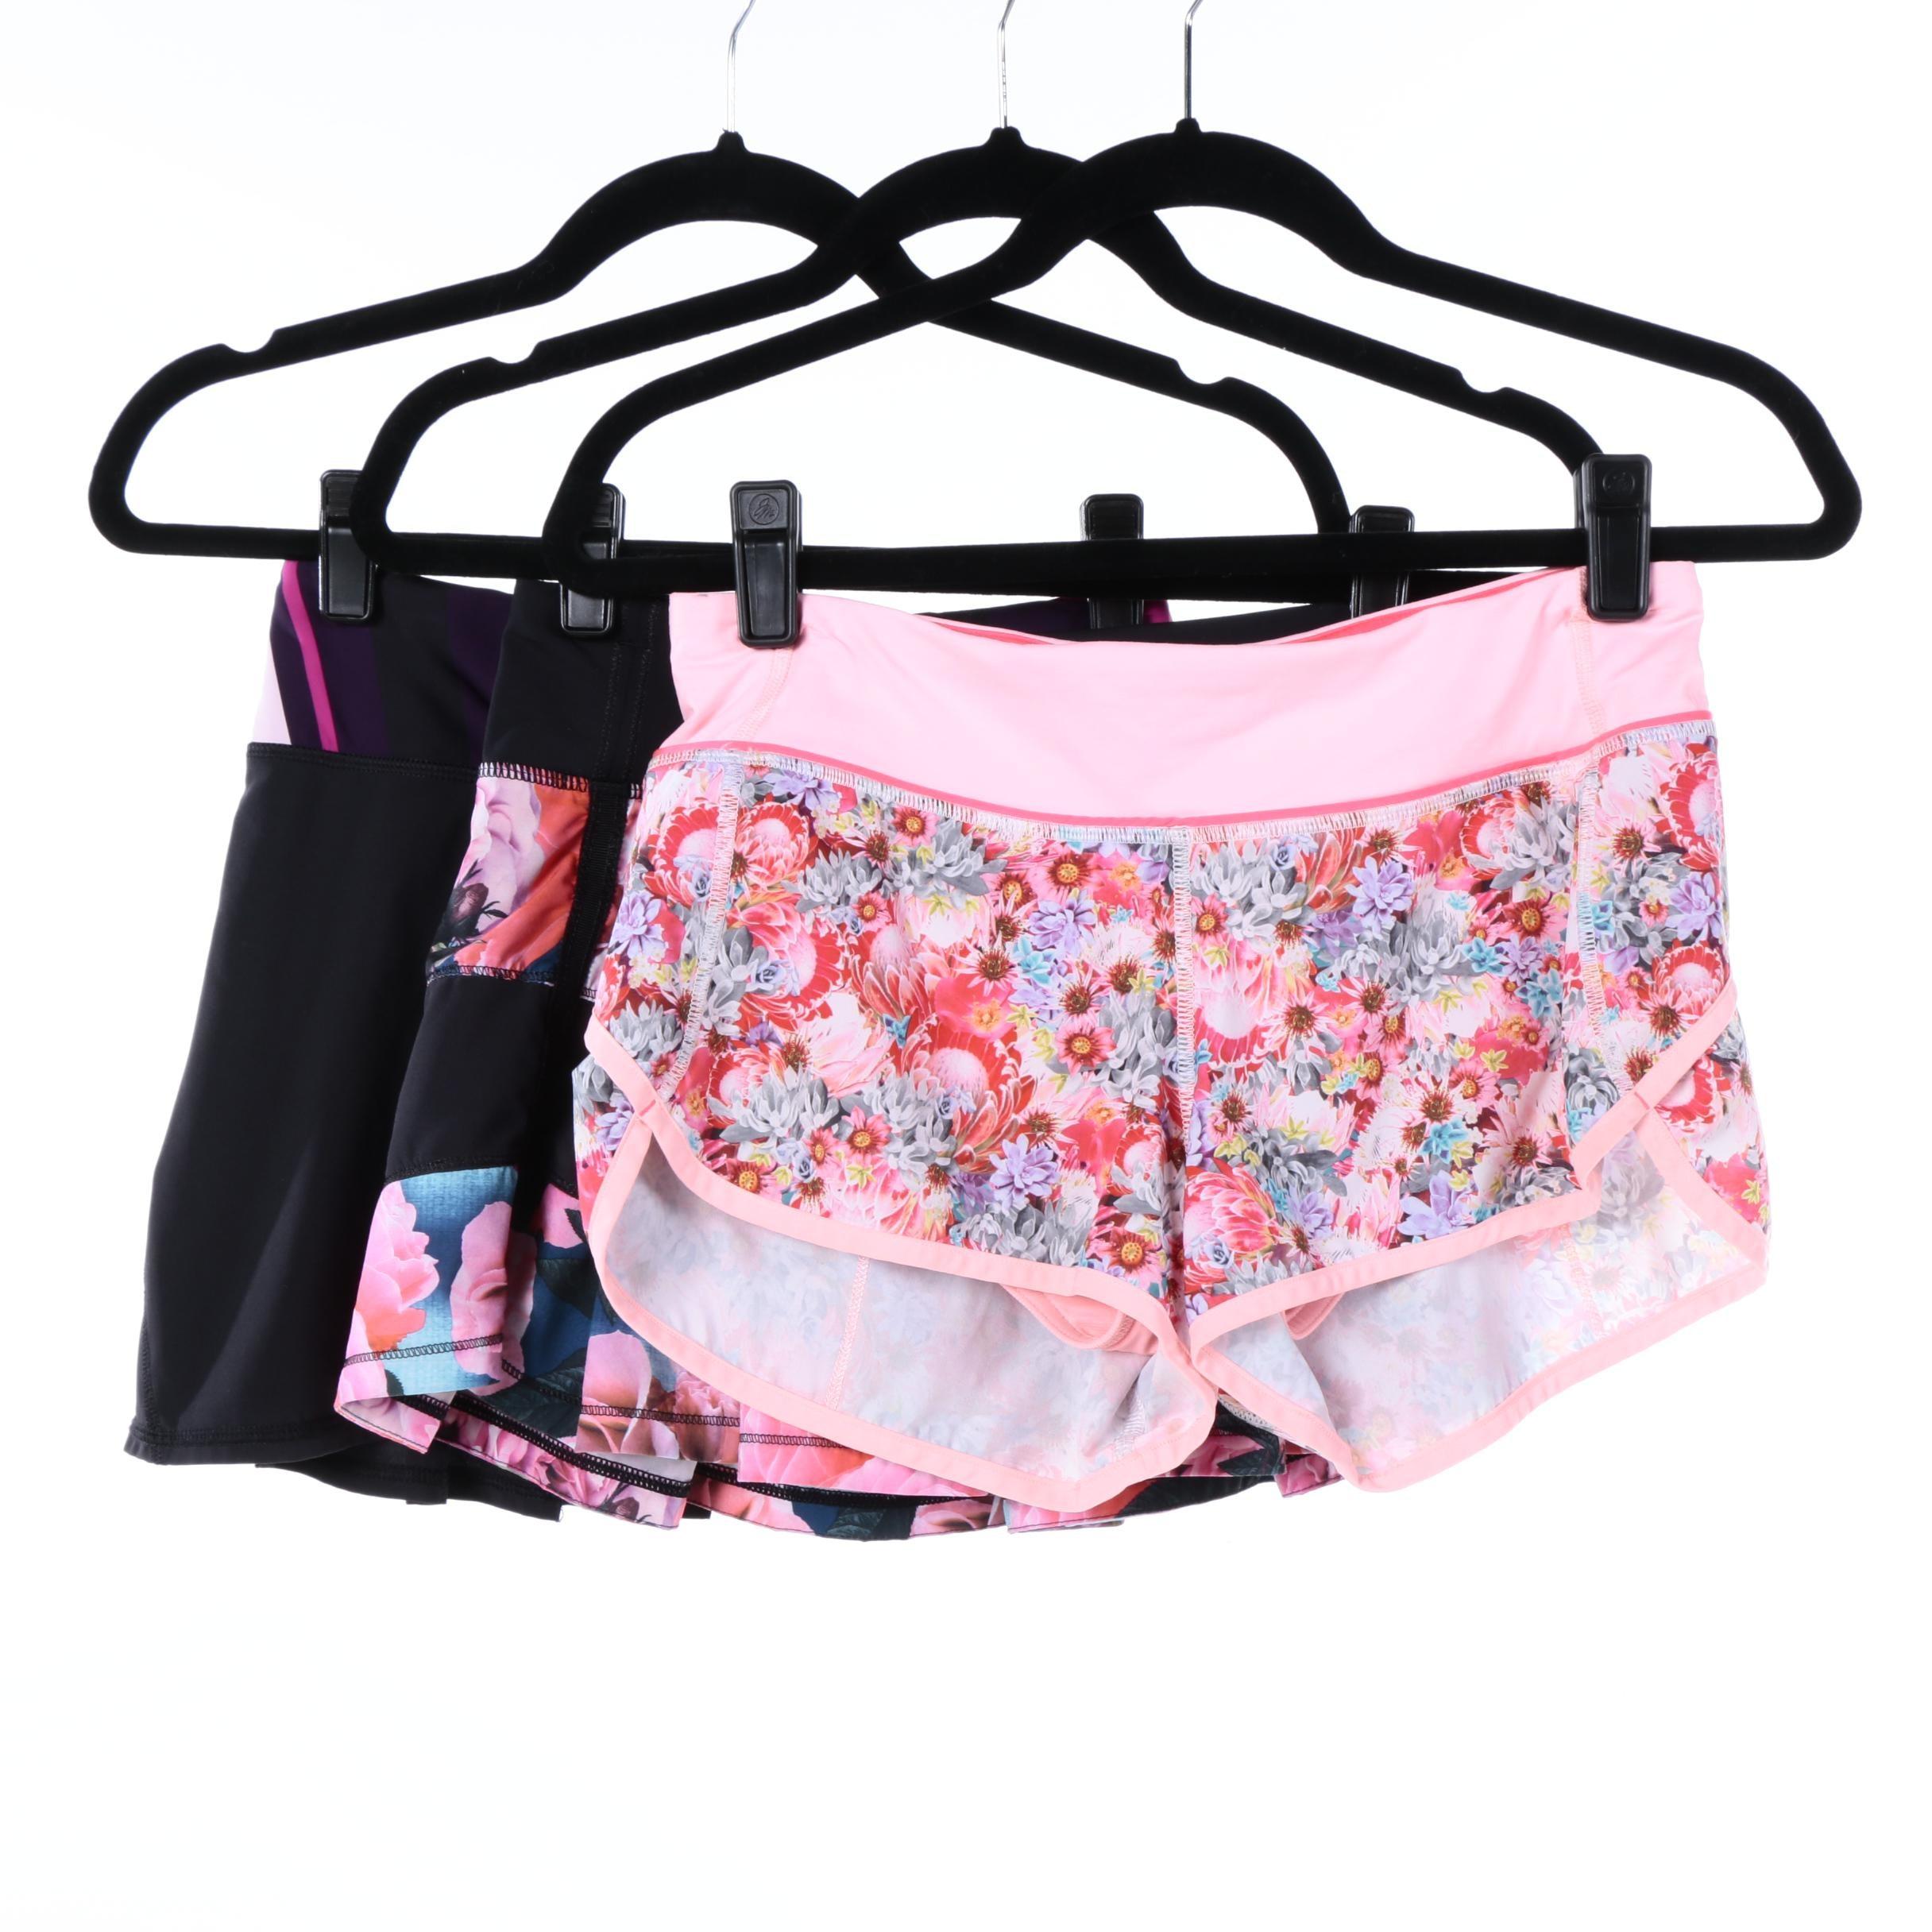 Lululemon Tennis Skirts and Running Shorts